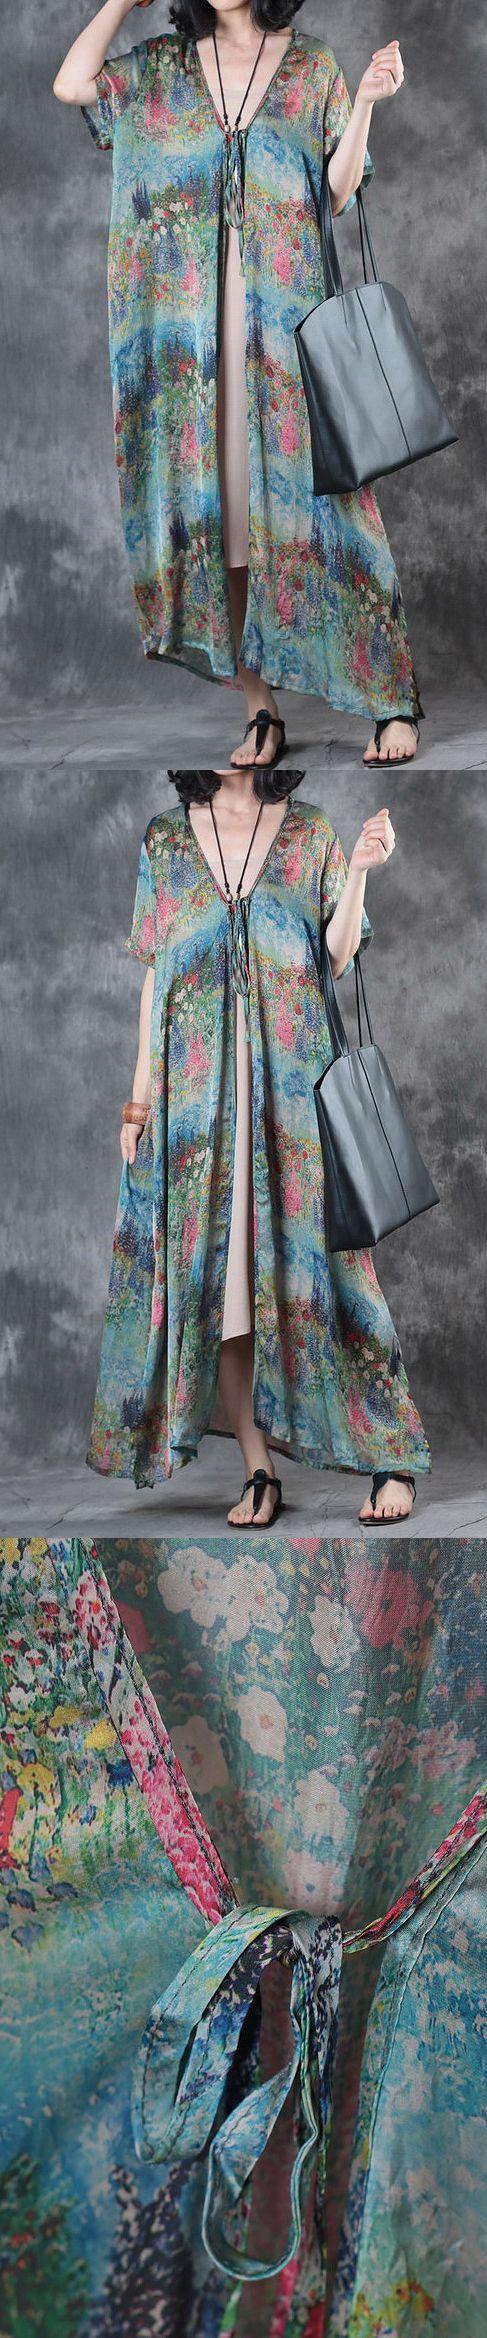 blue print silk dresses plus size casual women sundress short sleeve cardigans maxi dress